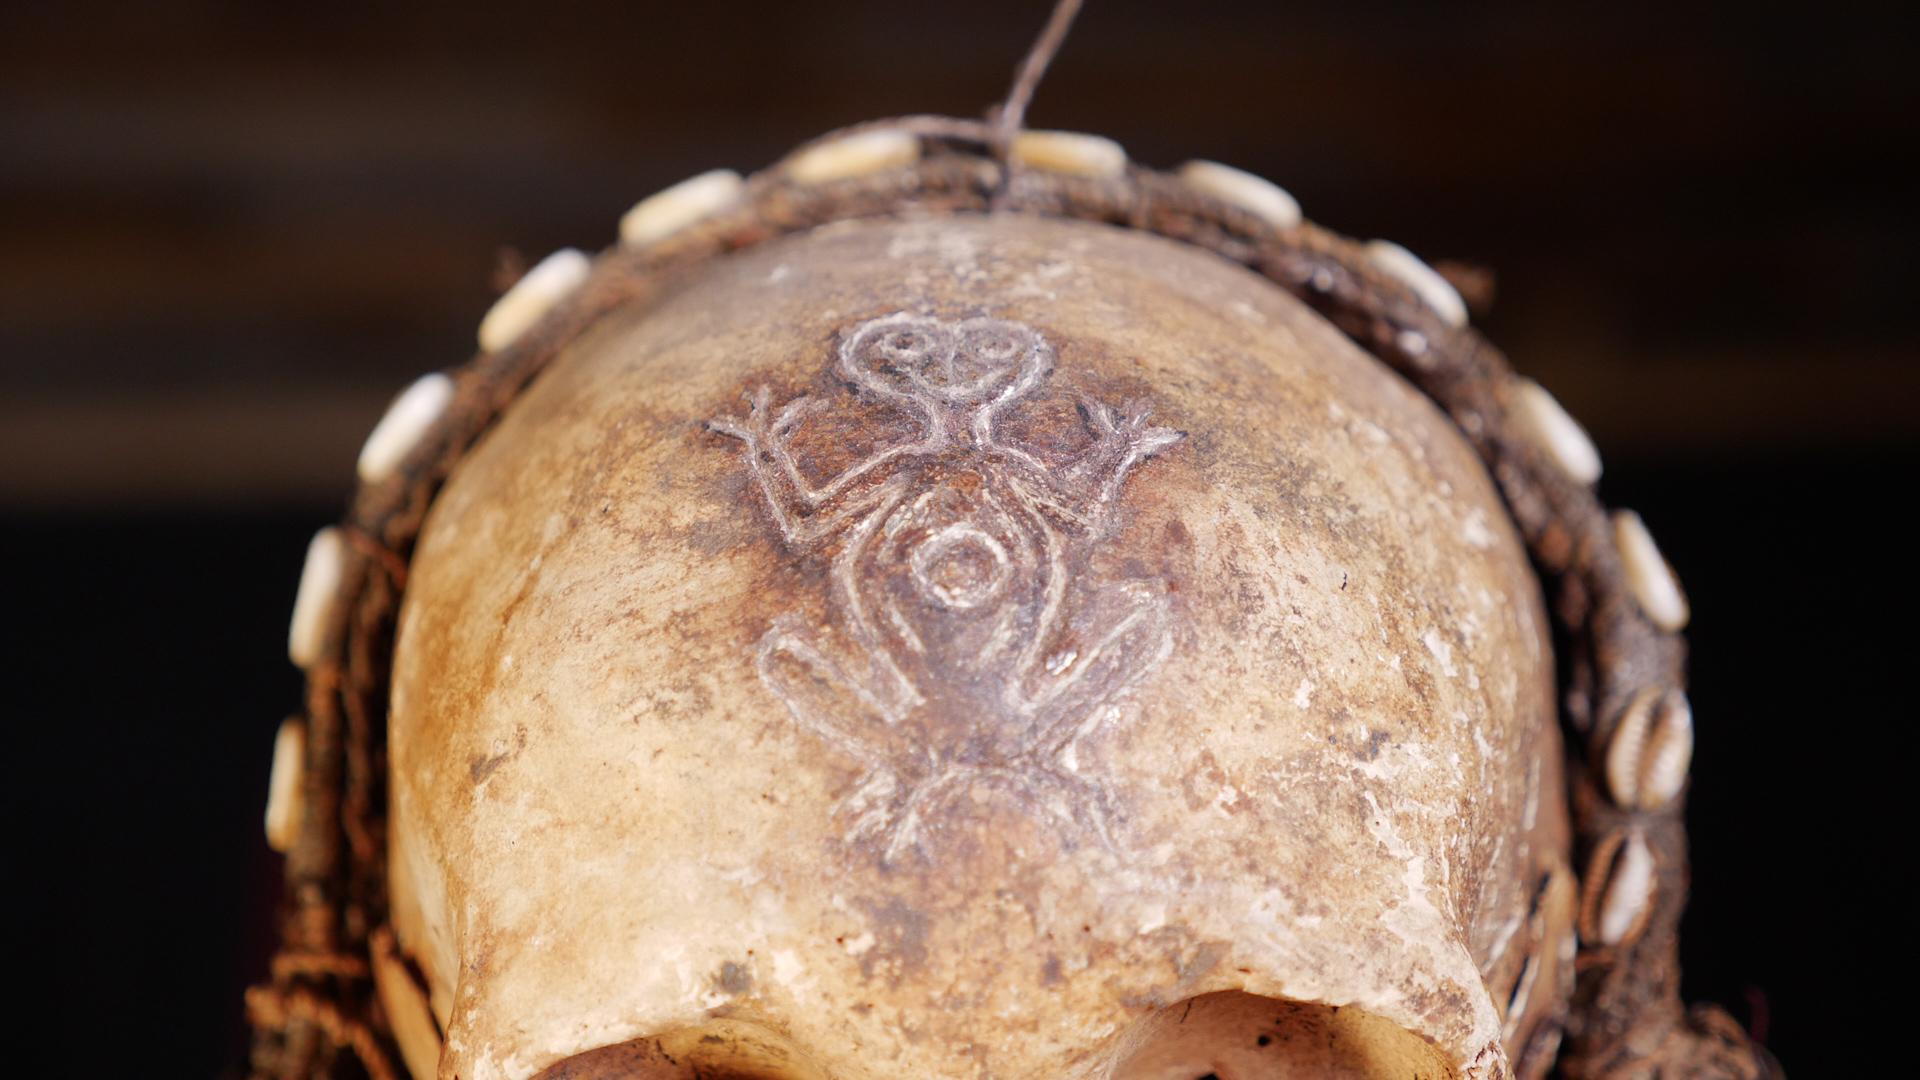 midwife skull closeup